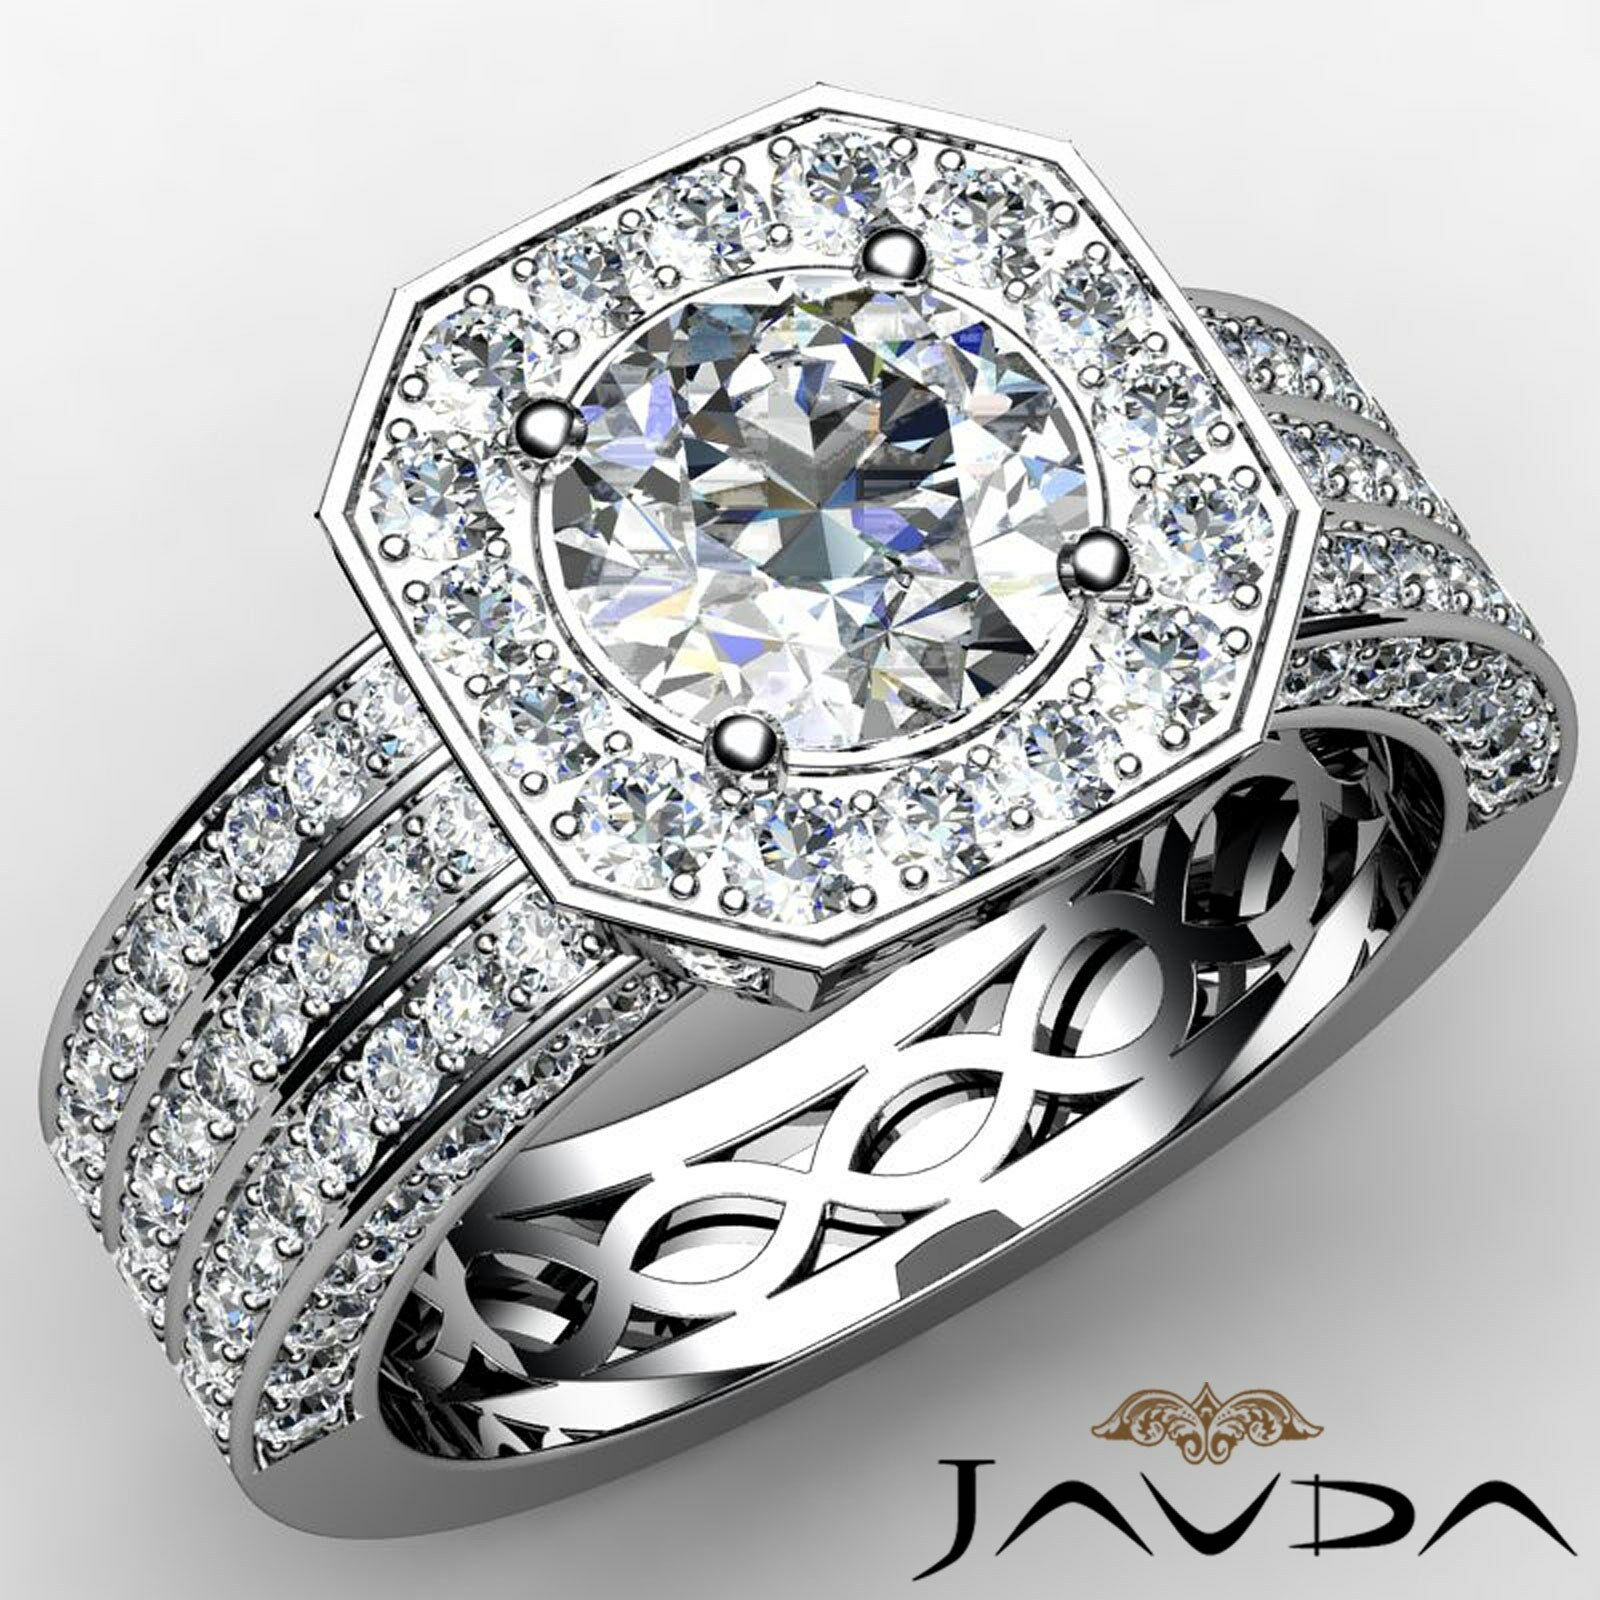 3 Row Shank Halo Pave Round Diamond Engagement Filigree Ring GIA I VS2 2.97 Ct